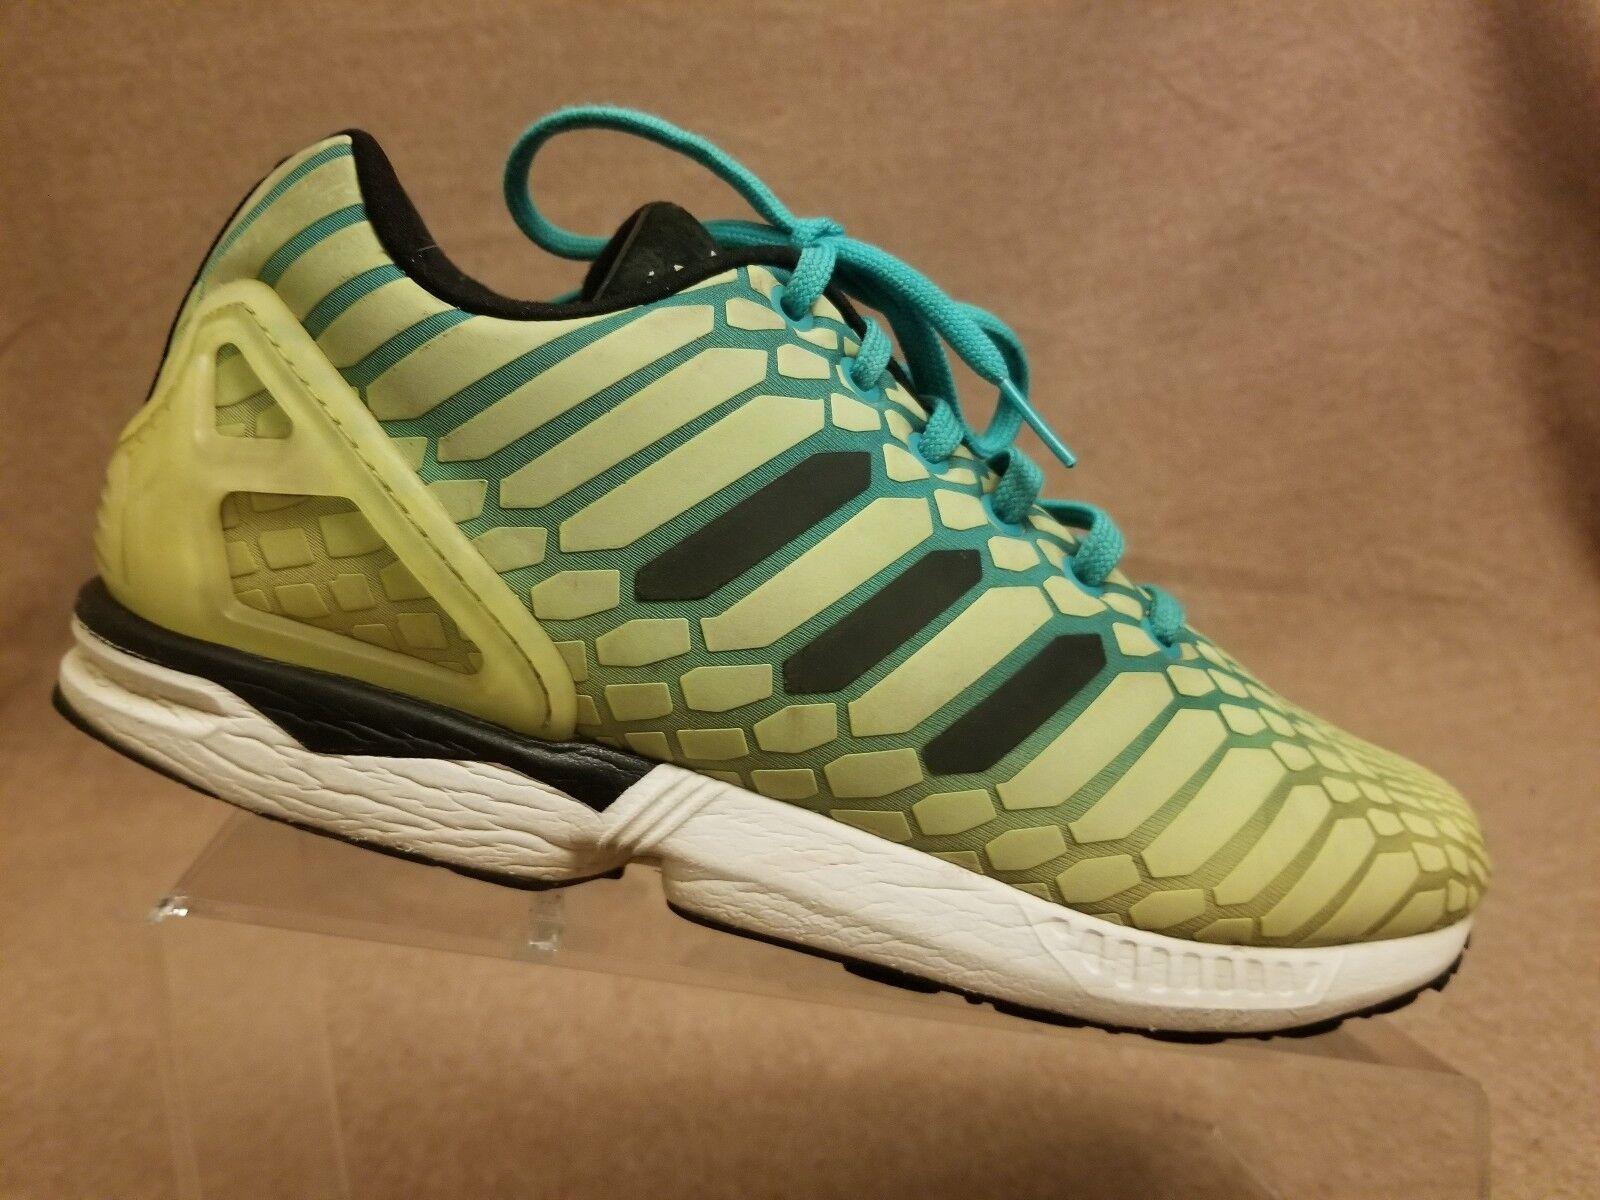 Adidas Flux AQ8212 ZX Flux Adidas XENO Reflective Glow Running Shoes Green Yellow Men Sz 8.5 0a18a4